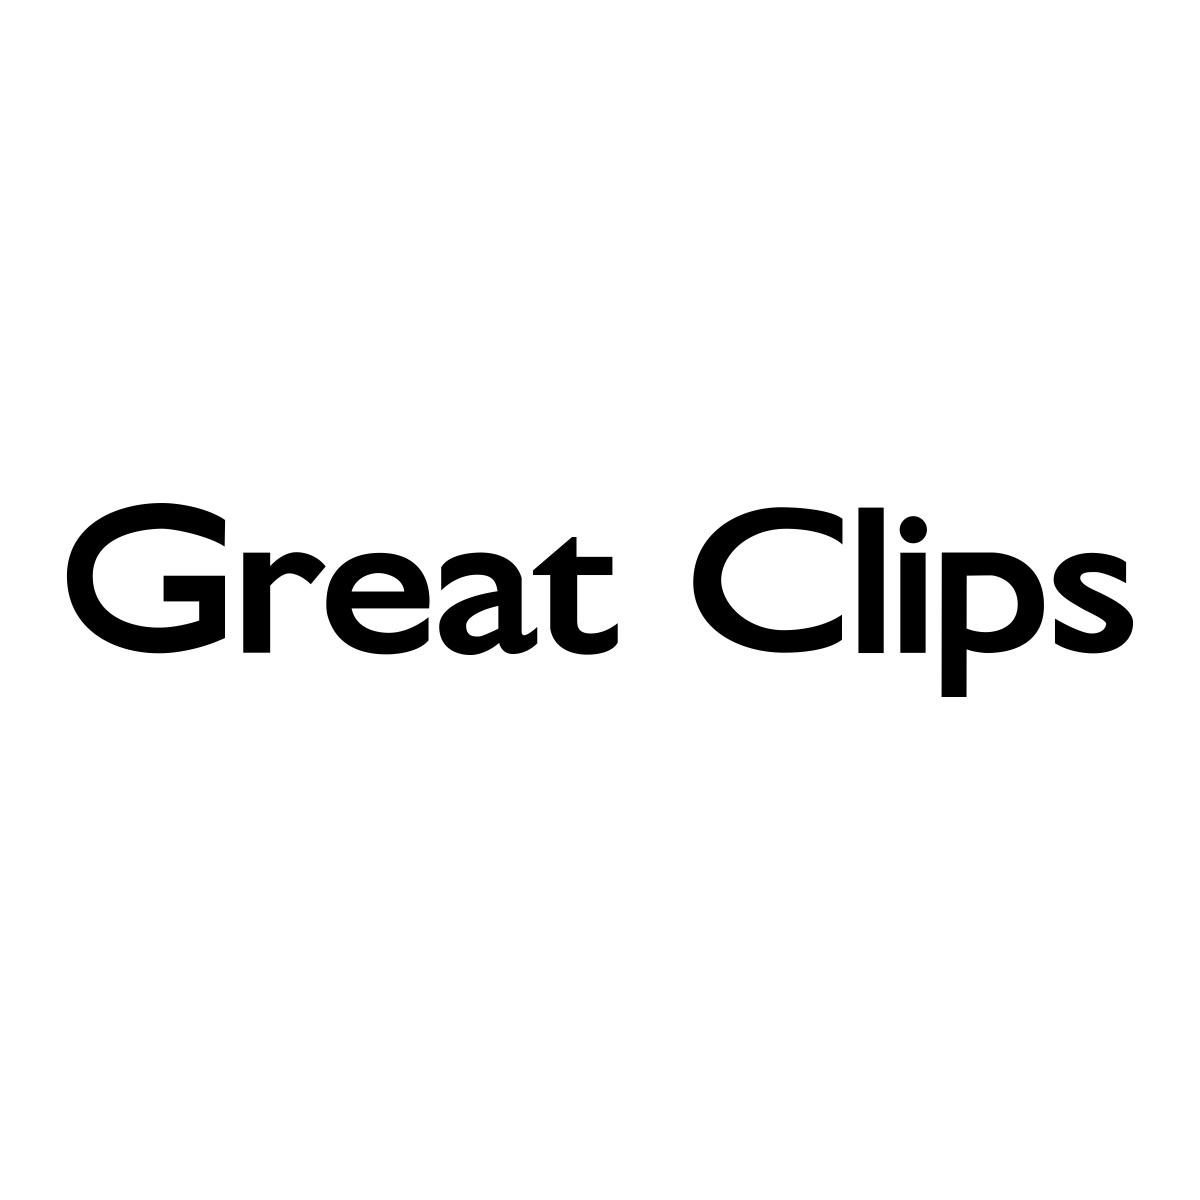 https://secureservercdn.net/45.40.150.47/08r.a40.myftpupload.com/wp-content/uploads/2019/04/Great-Clips.jpg